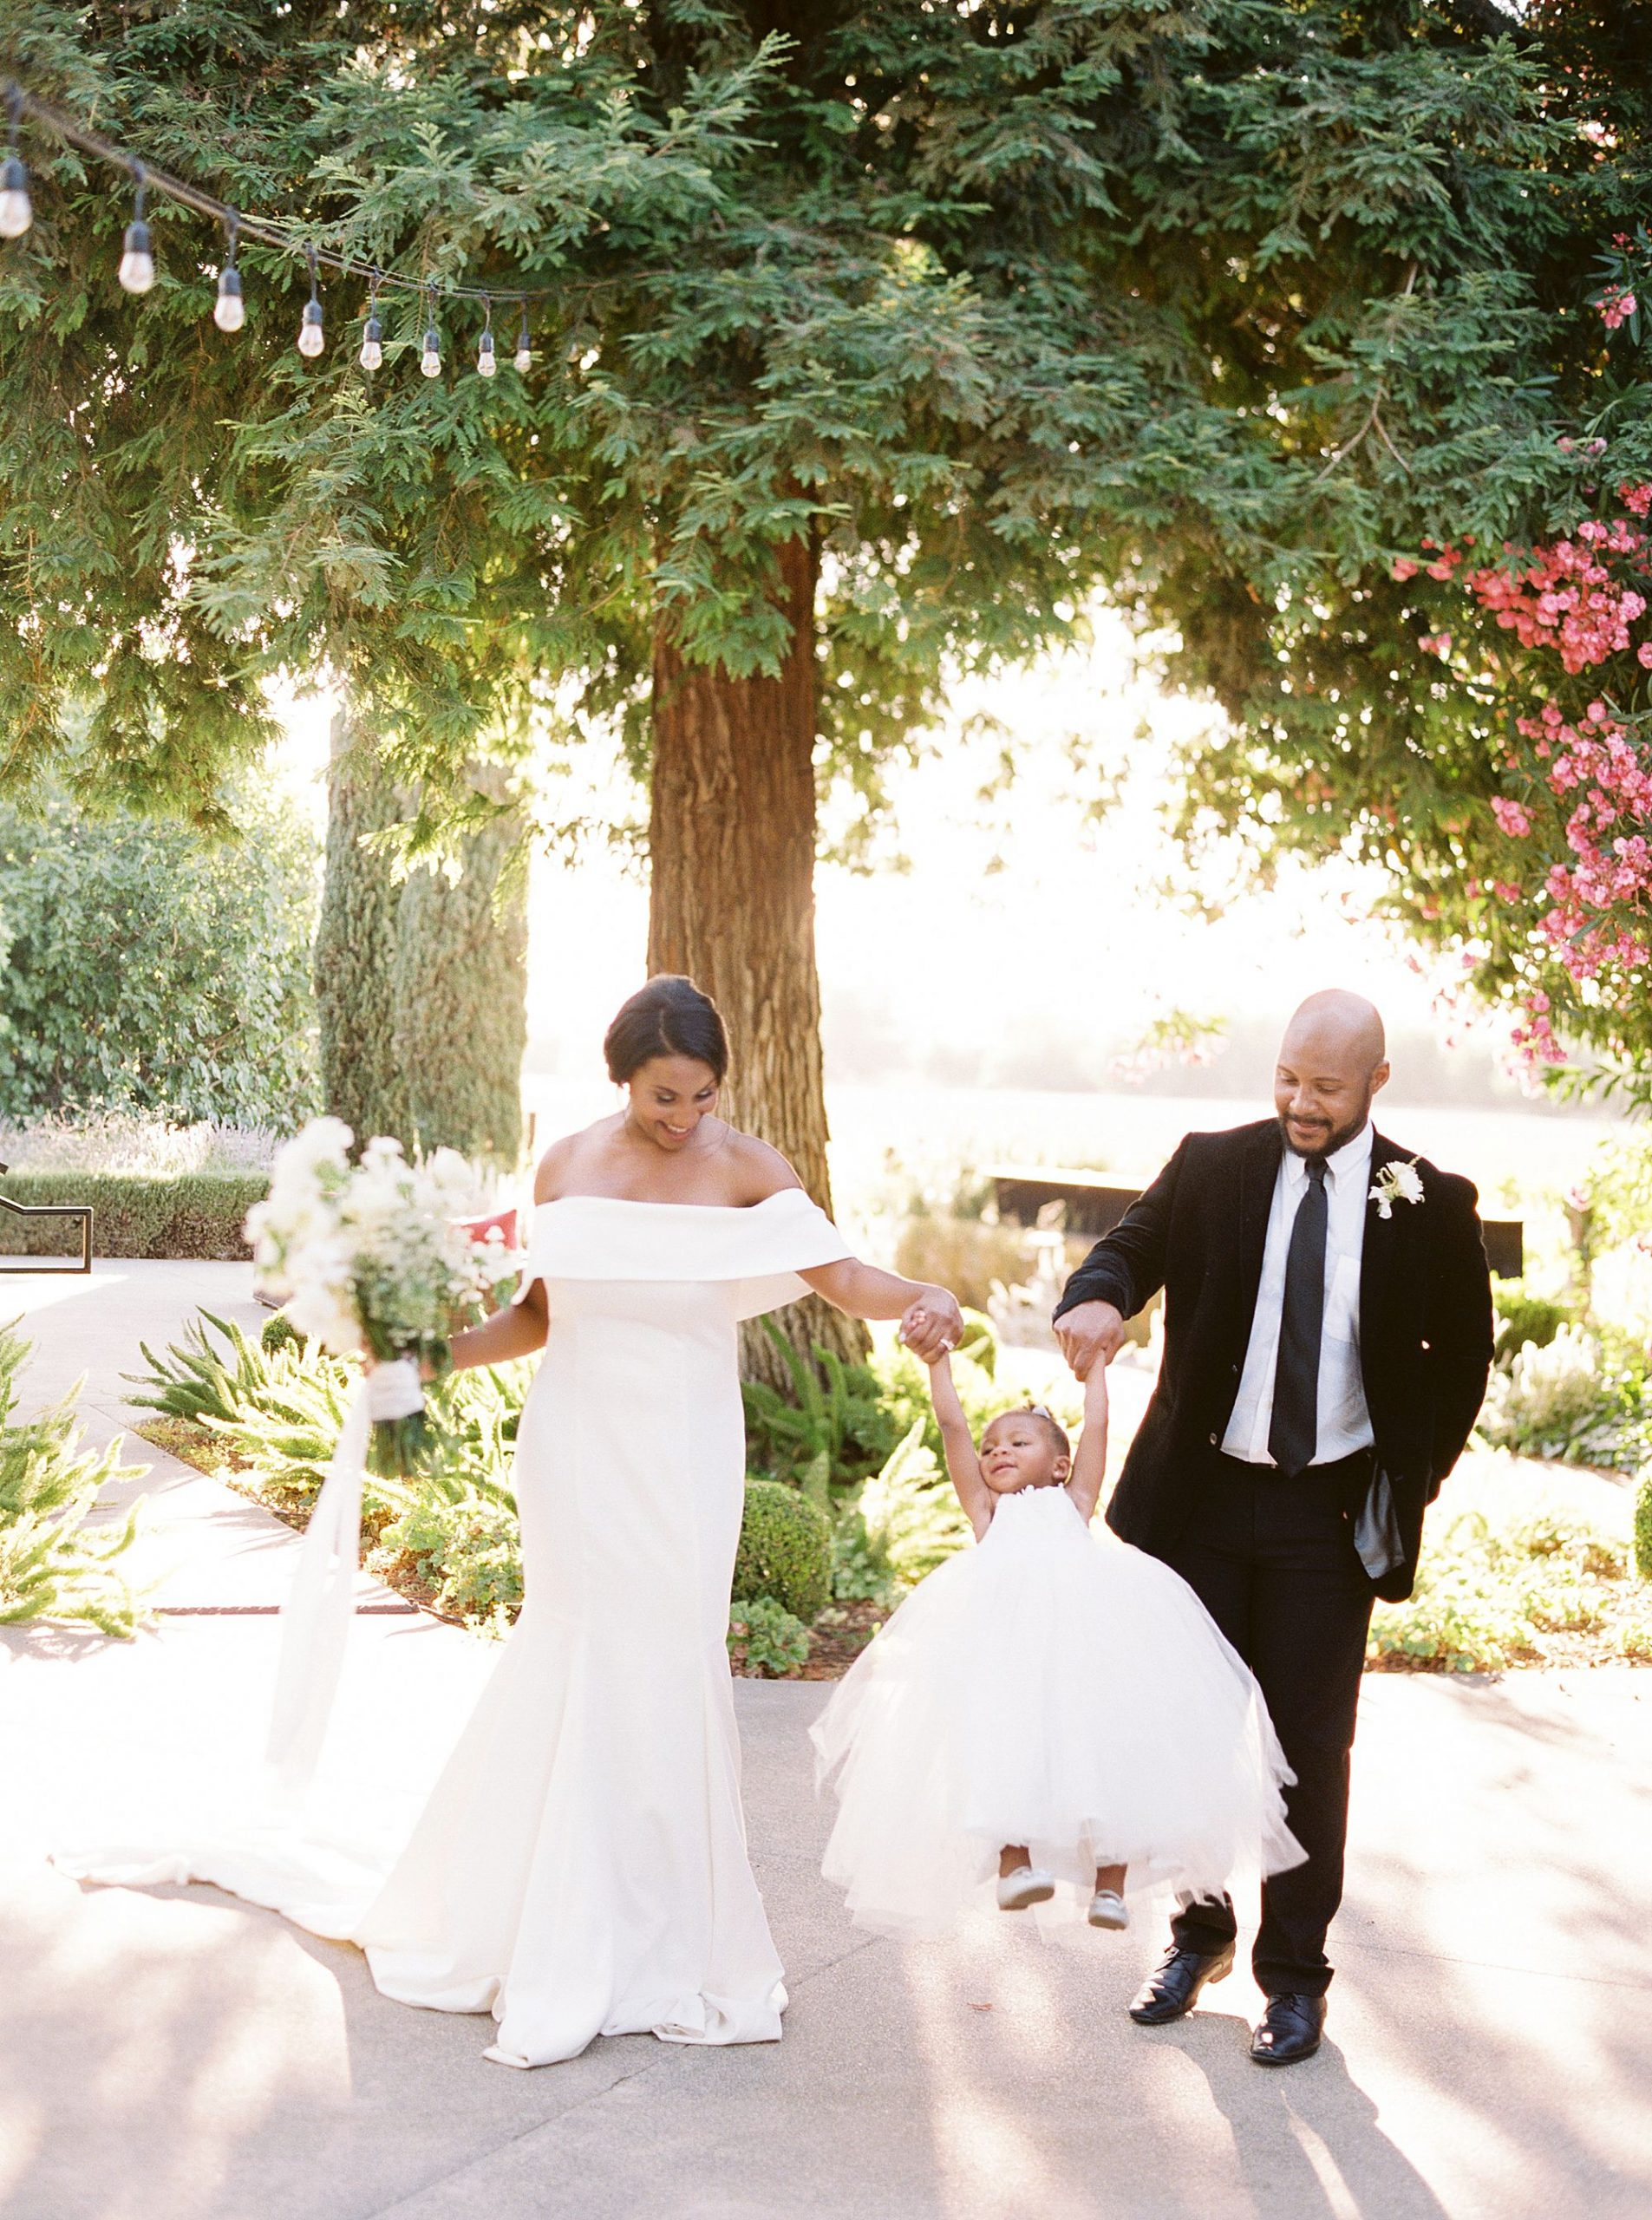 Park Winters Micro-Wedding Inspiration on Style Me Pretty - Stephanie Teague Events - Ashley Baumgartner - Park Winters Wedding - Black Tie Wedding - Micro-Wedding Sacramento Photographer_0052.jpg